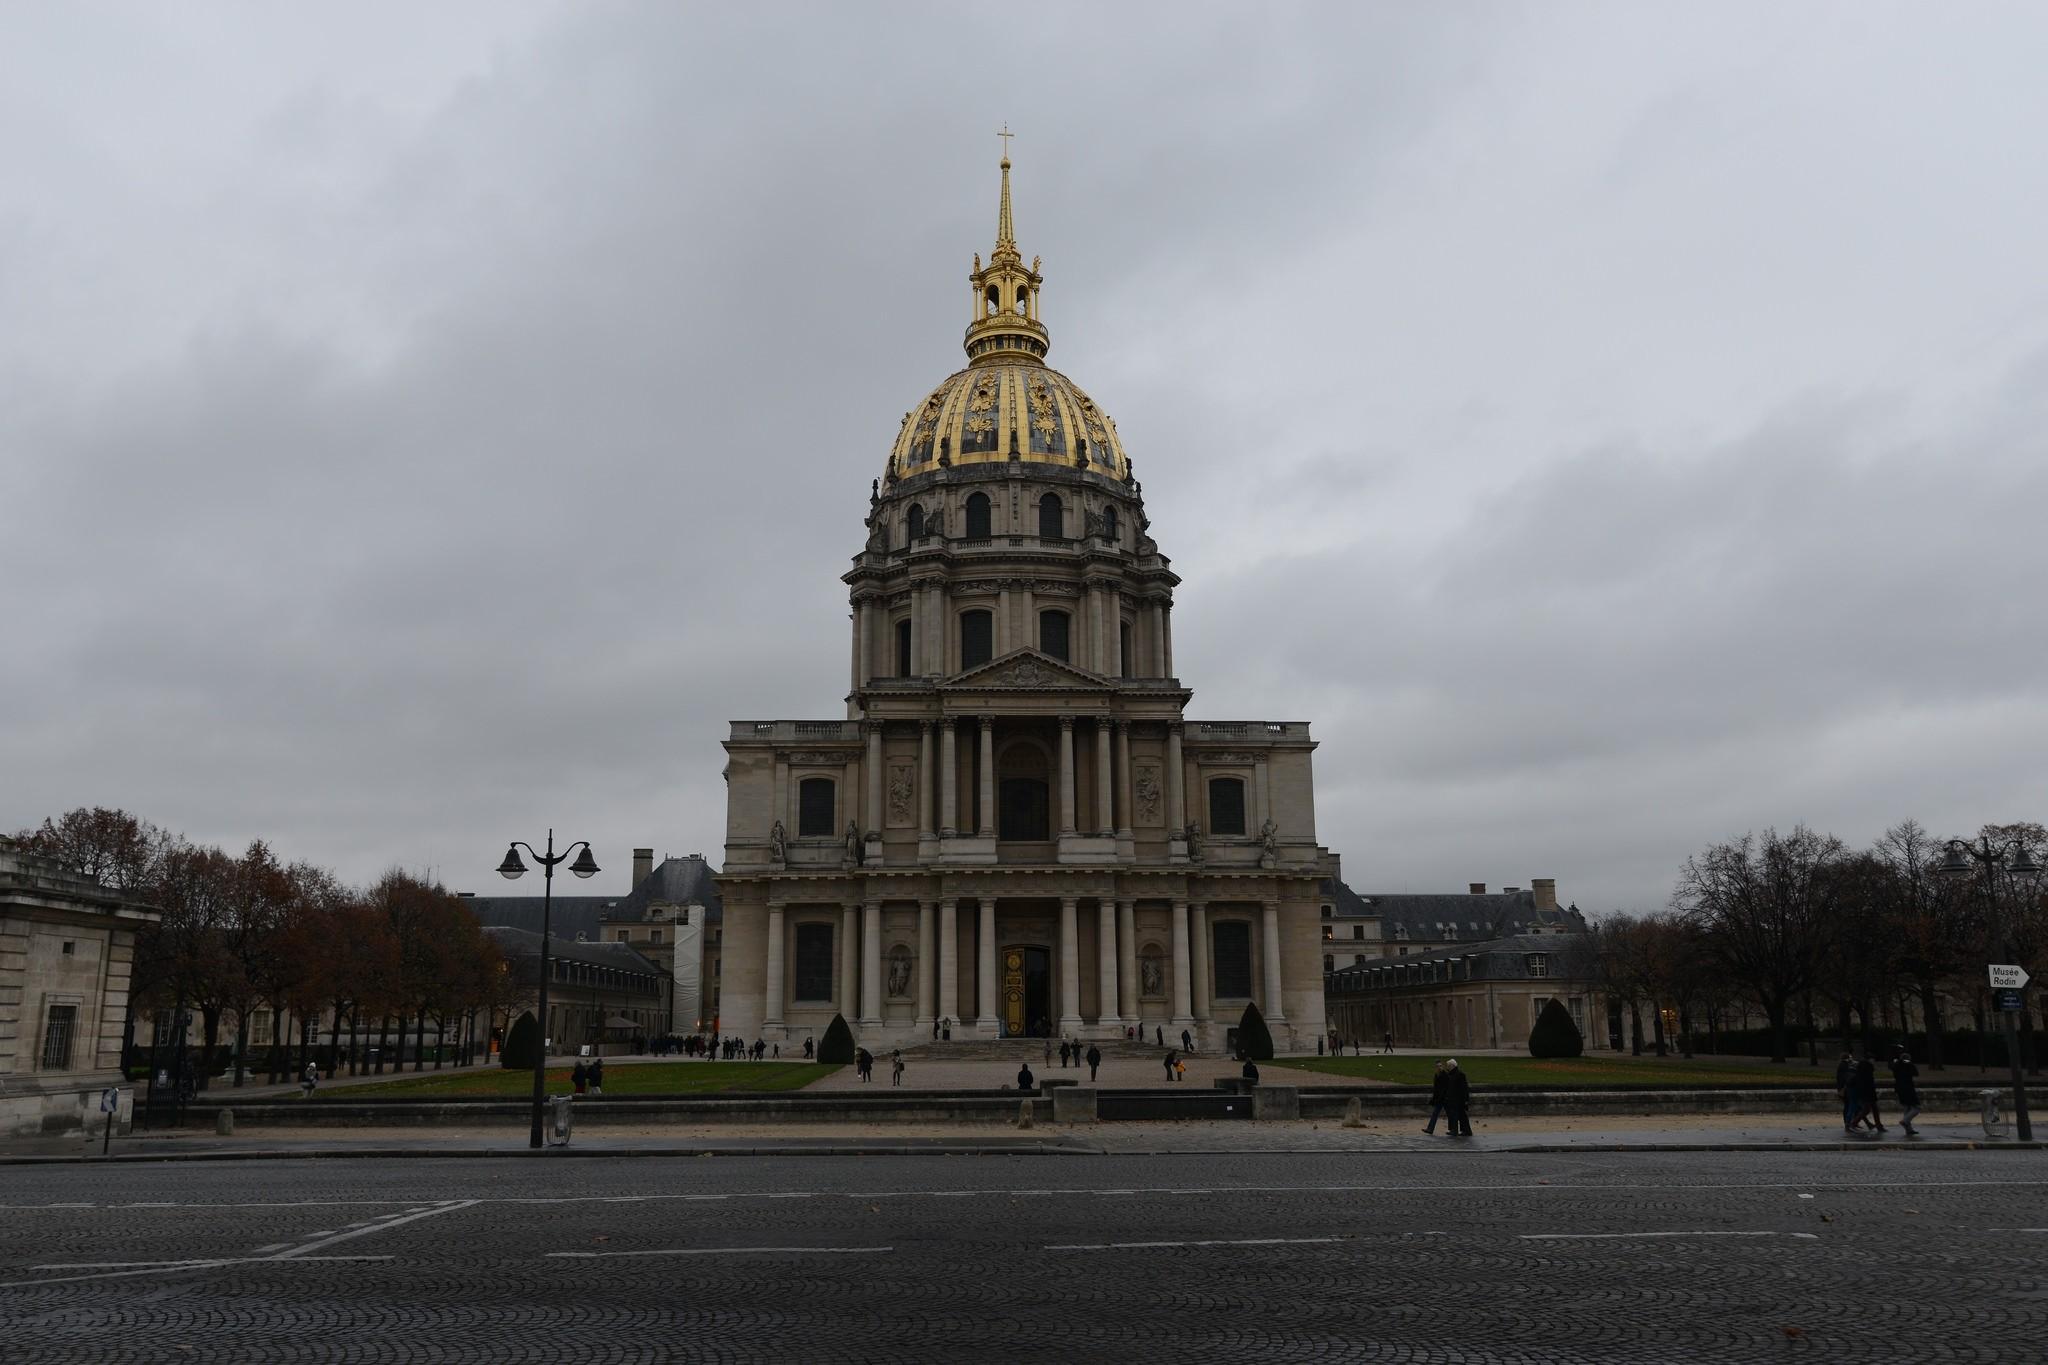 Musee de lu2019Armee (Army Museum) in Paris, France. (File Photo)